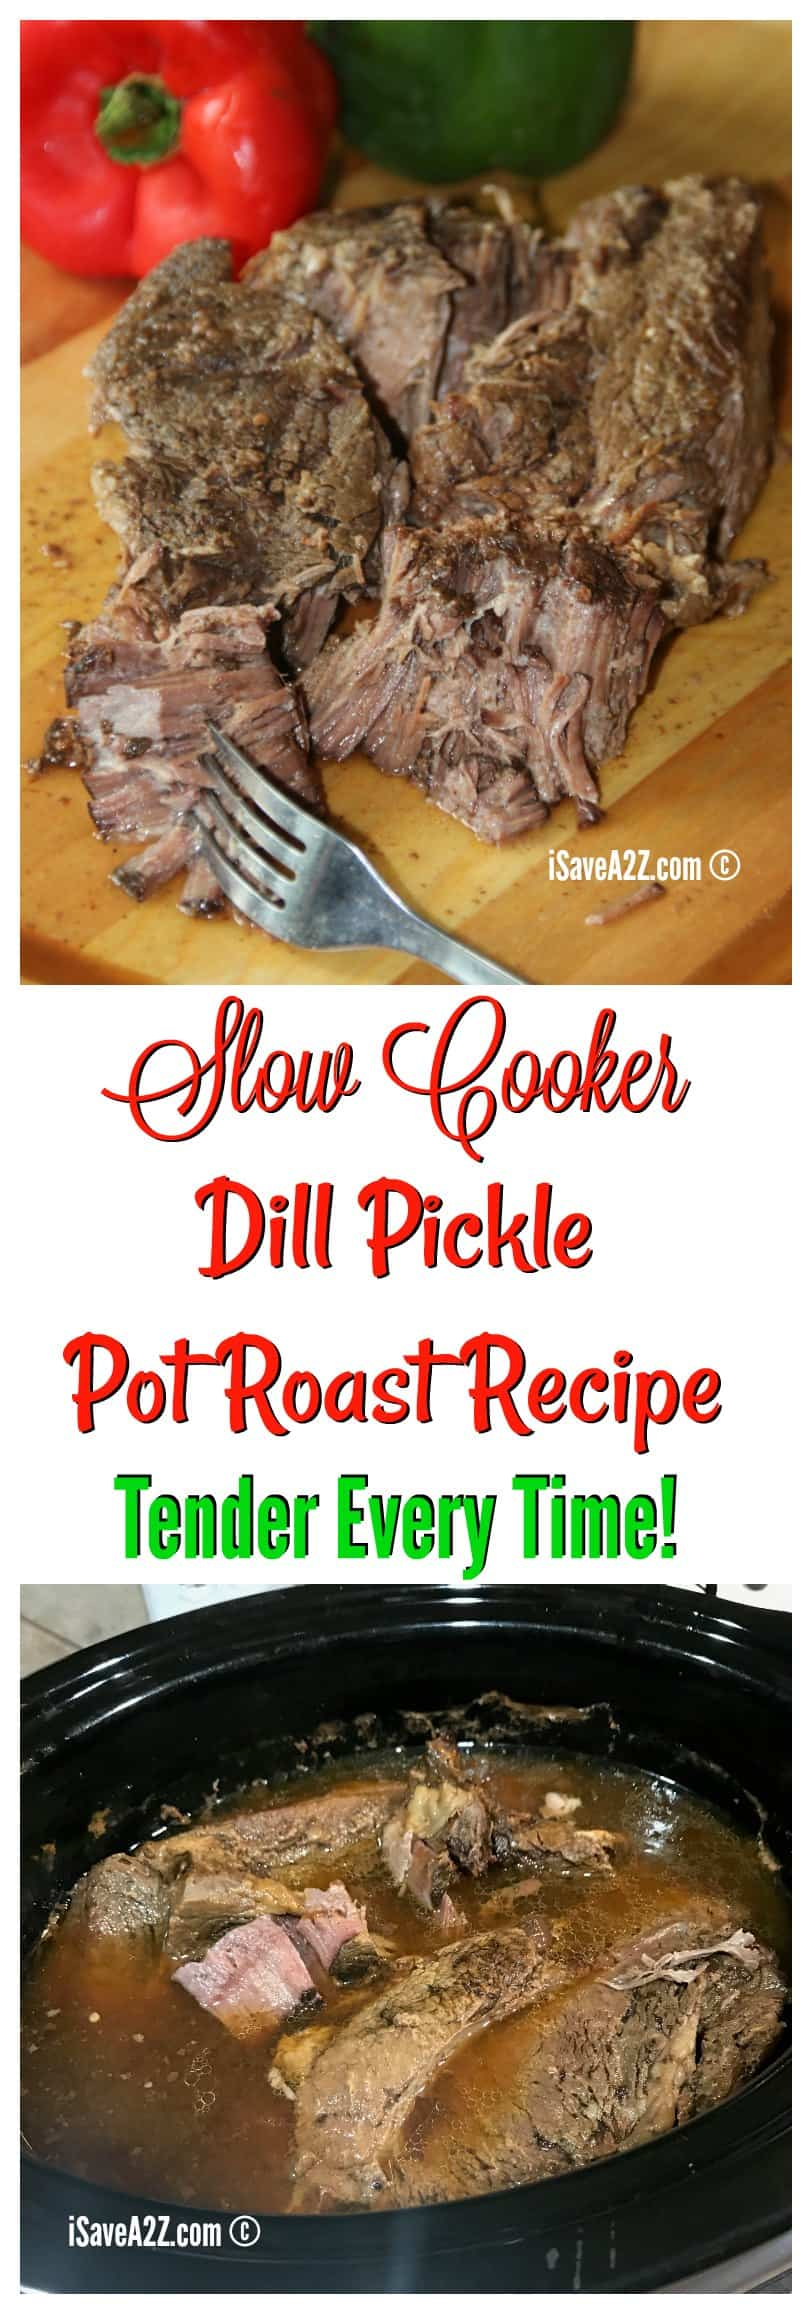 Slow Cooker Dill Pickle Pot Roast Recipe